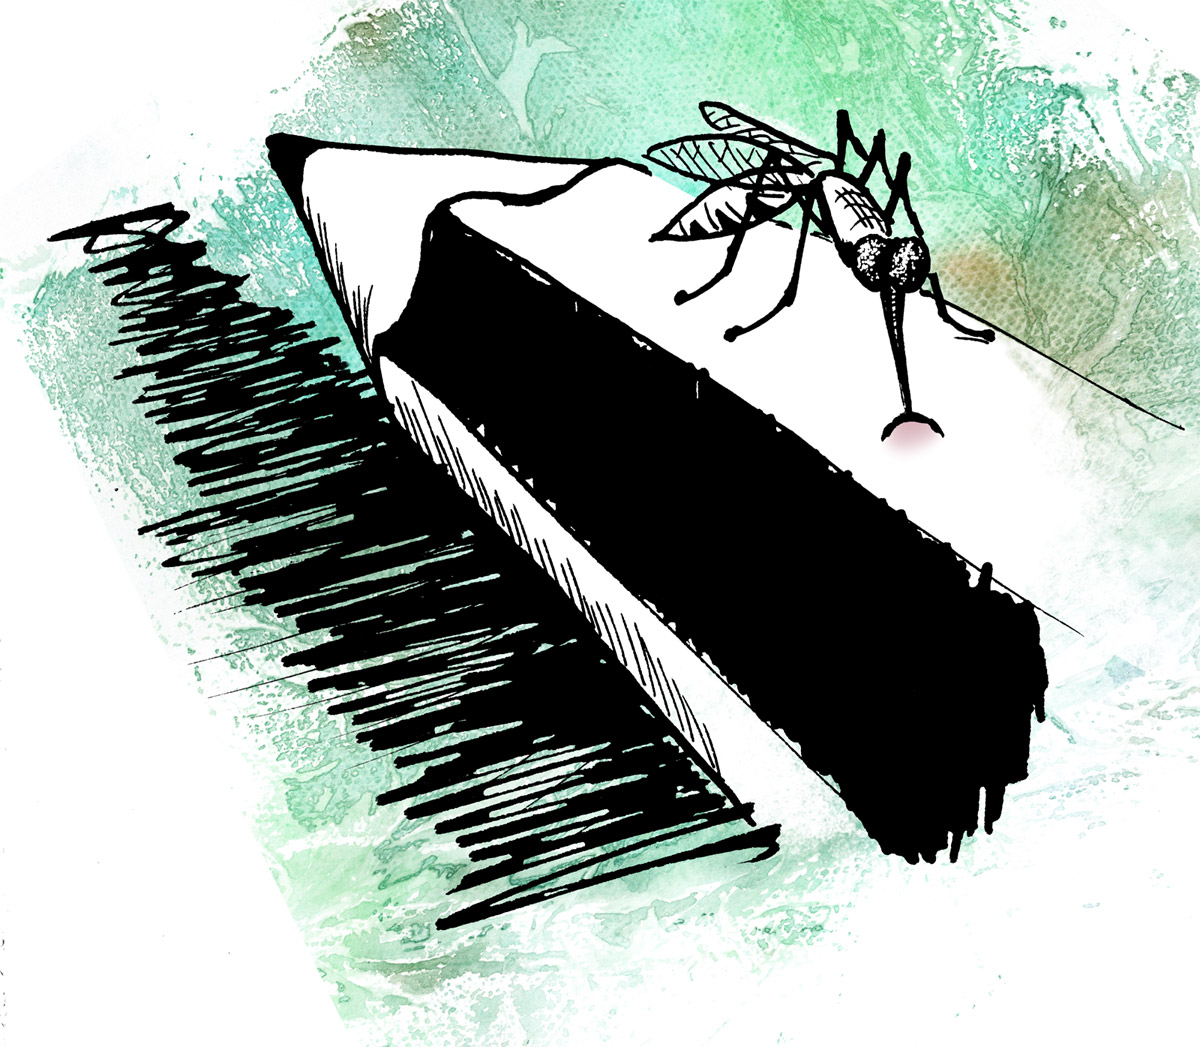 onspec_mosquito.jpg